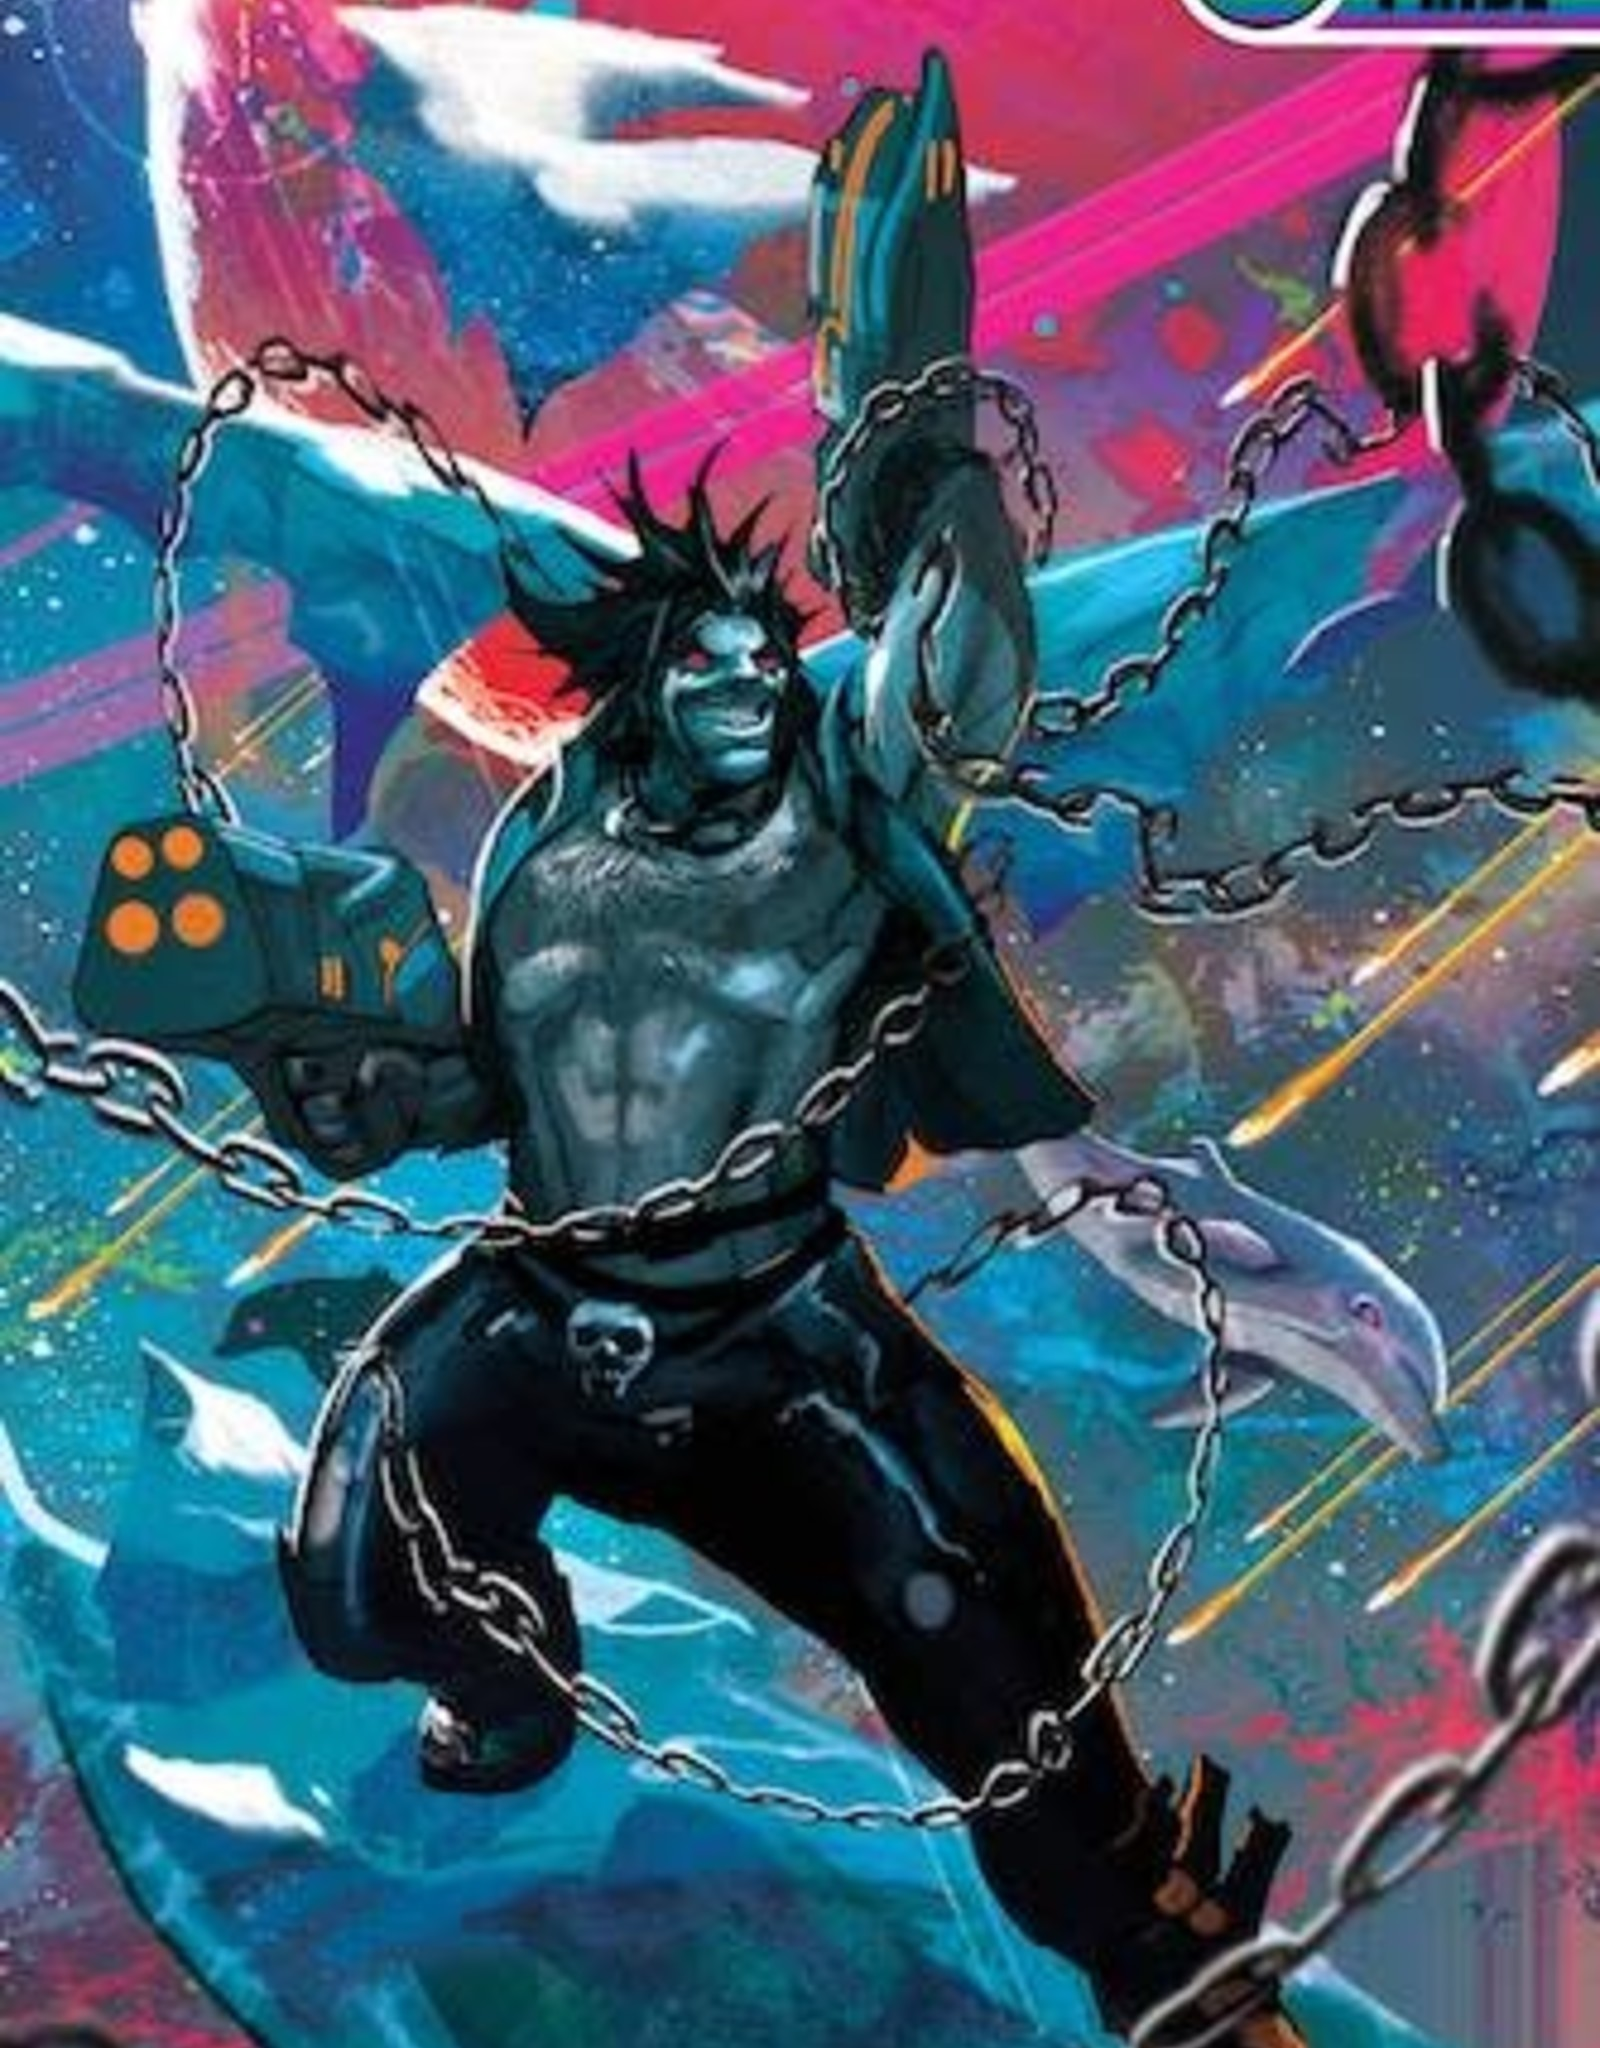 DC Comics Crush & Lobo #1 Inc 1:25 Christian Ward Card Stock Var